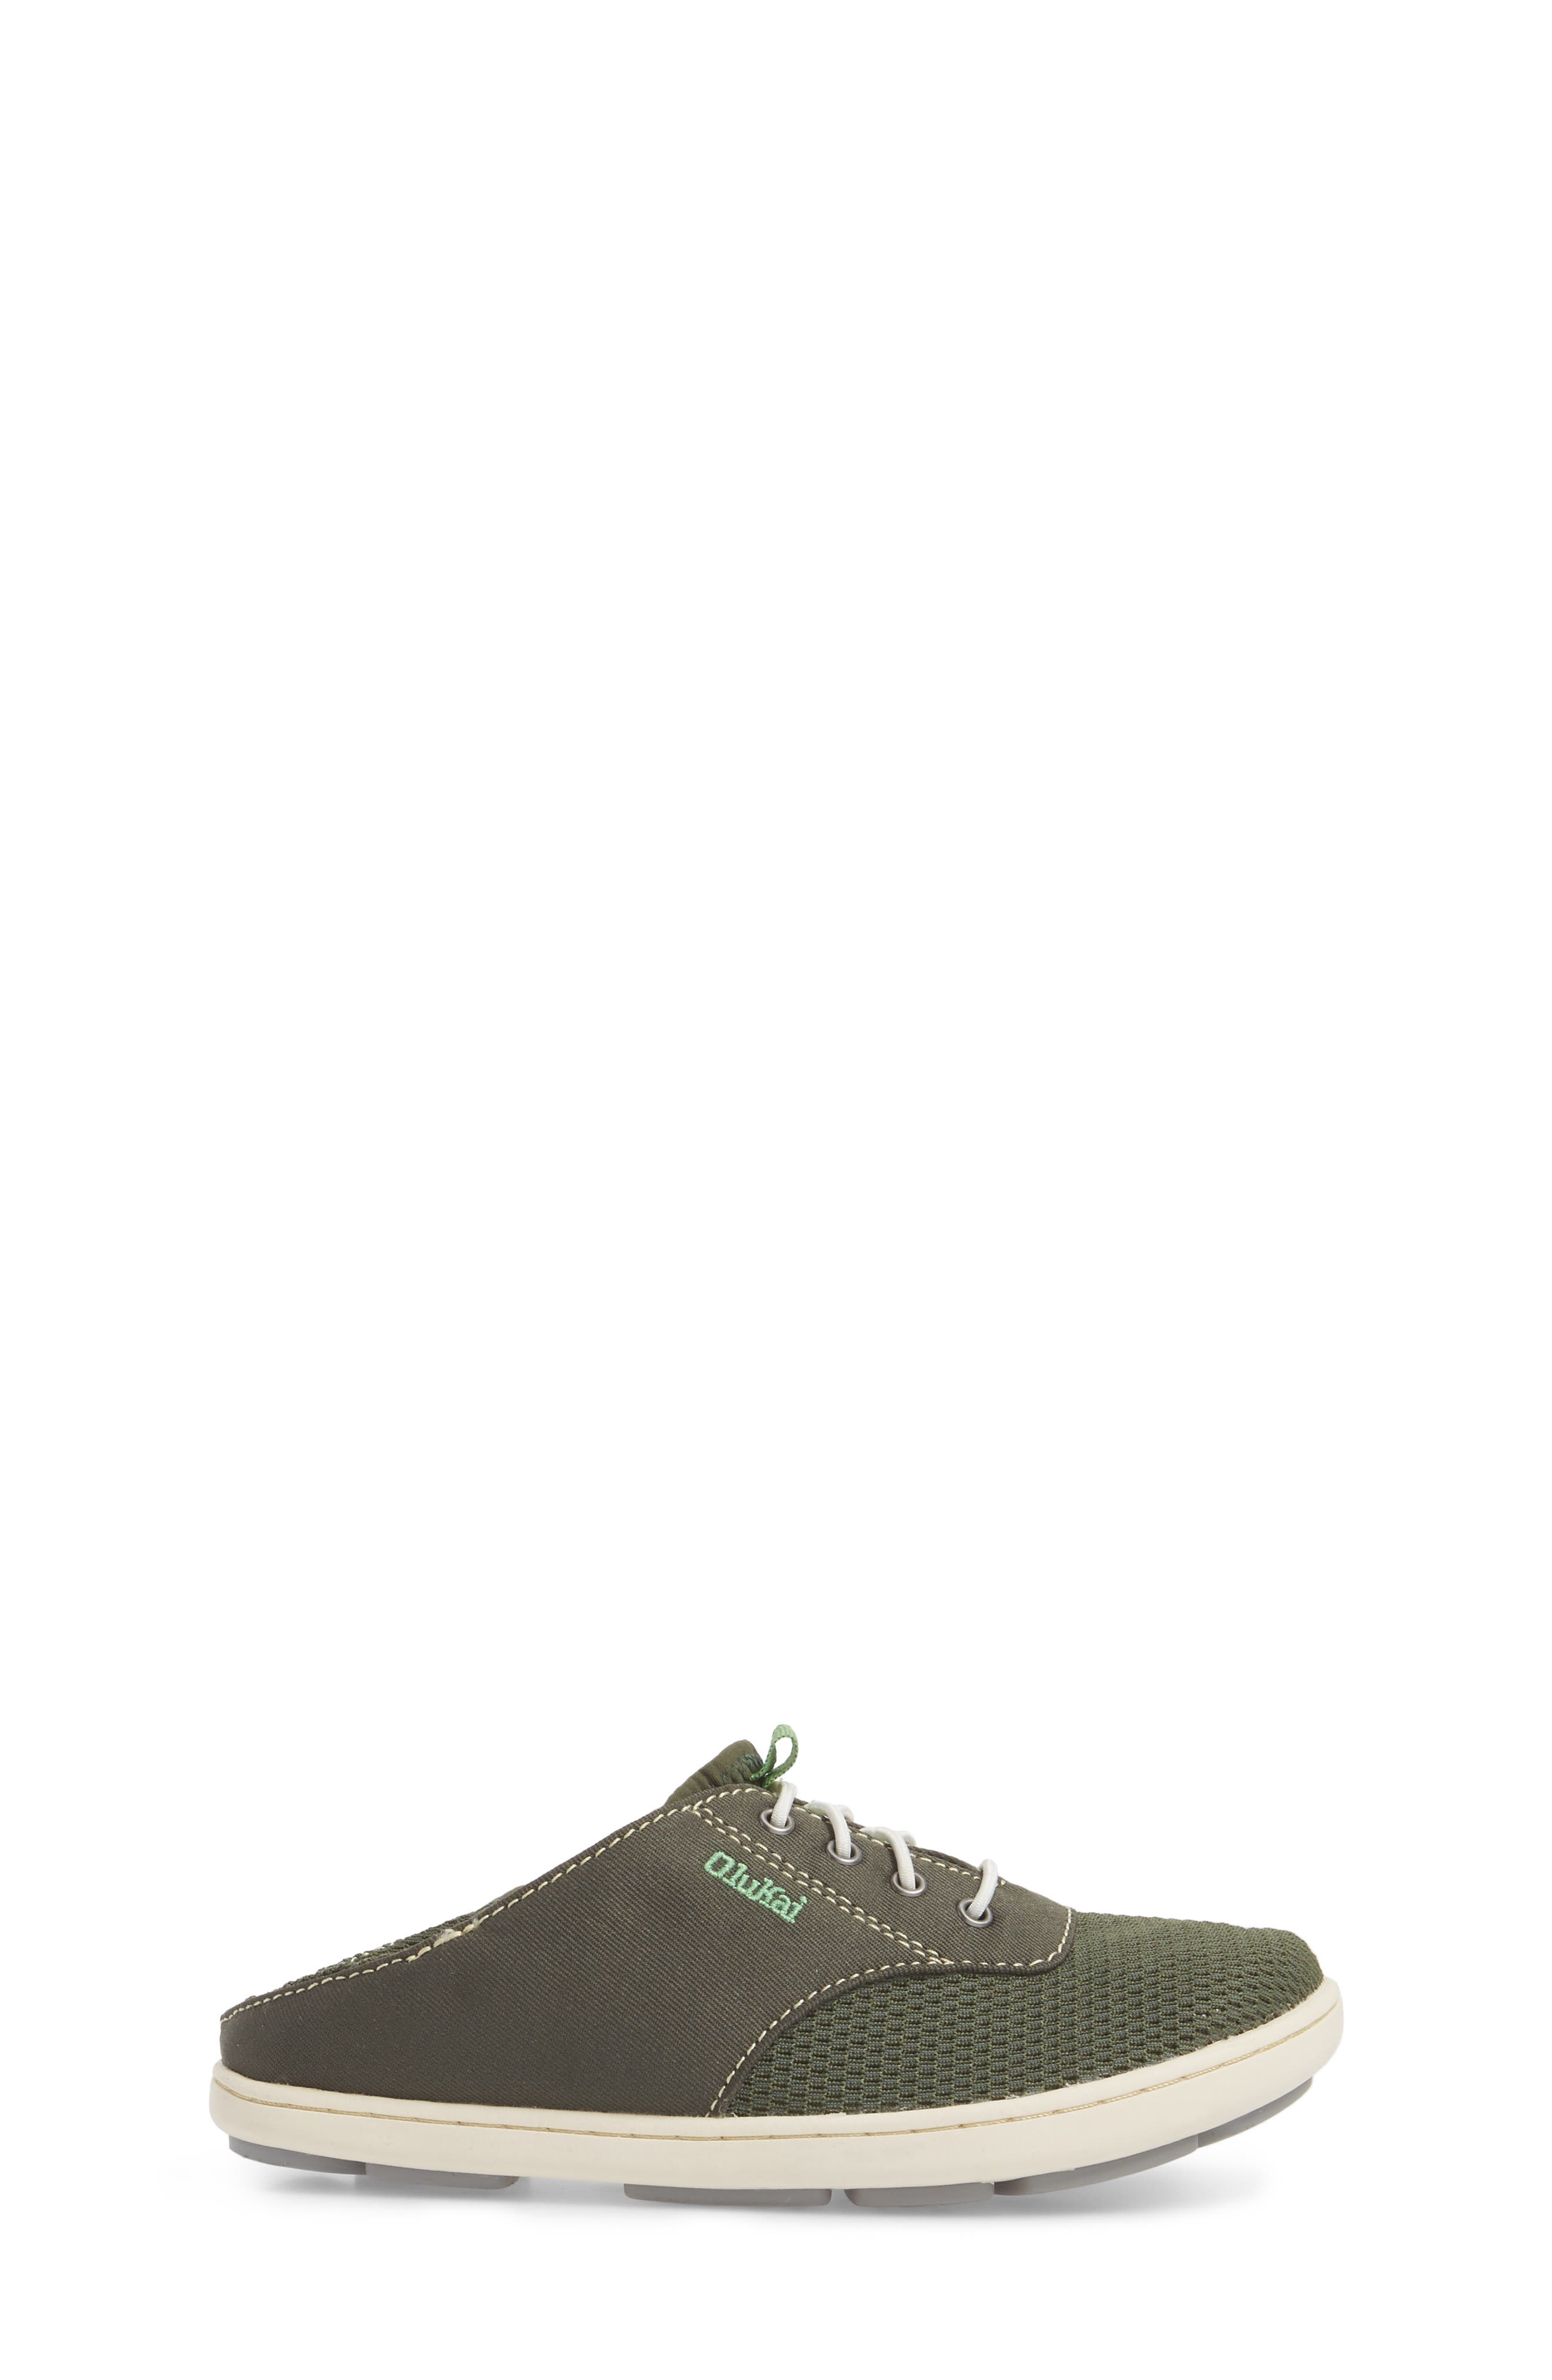 Nohea Moku Water Resistant Shoe,                             Alternate thumbnail 4, color,                             SEA GRASS/ SEA GRASS